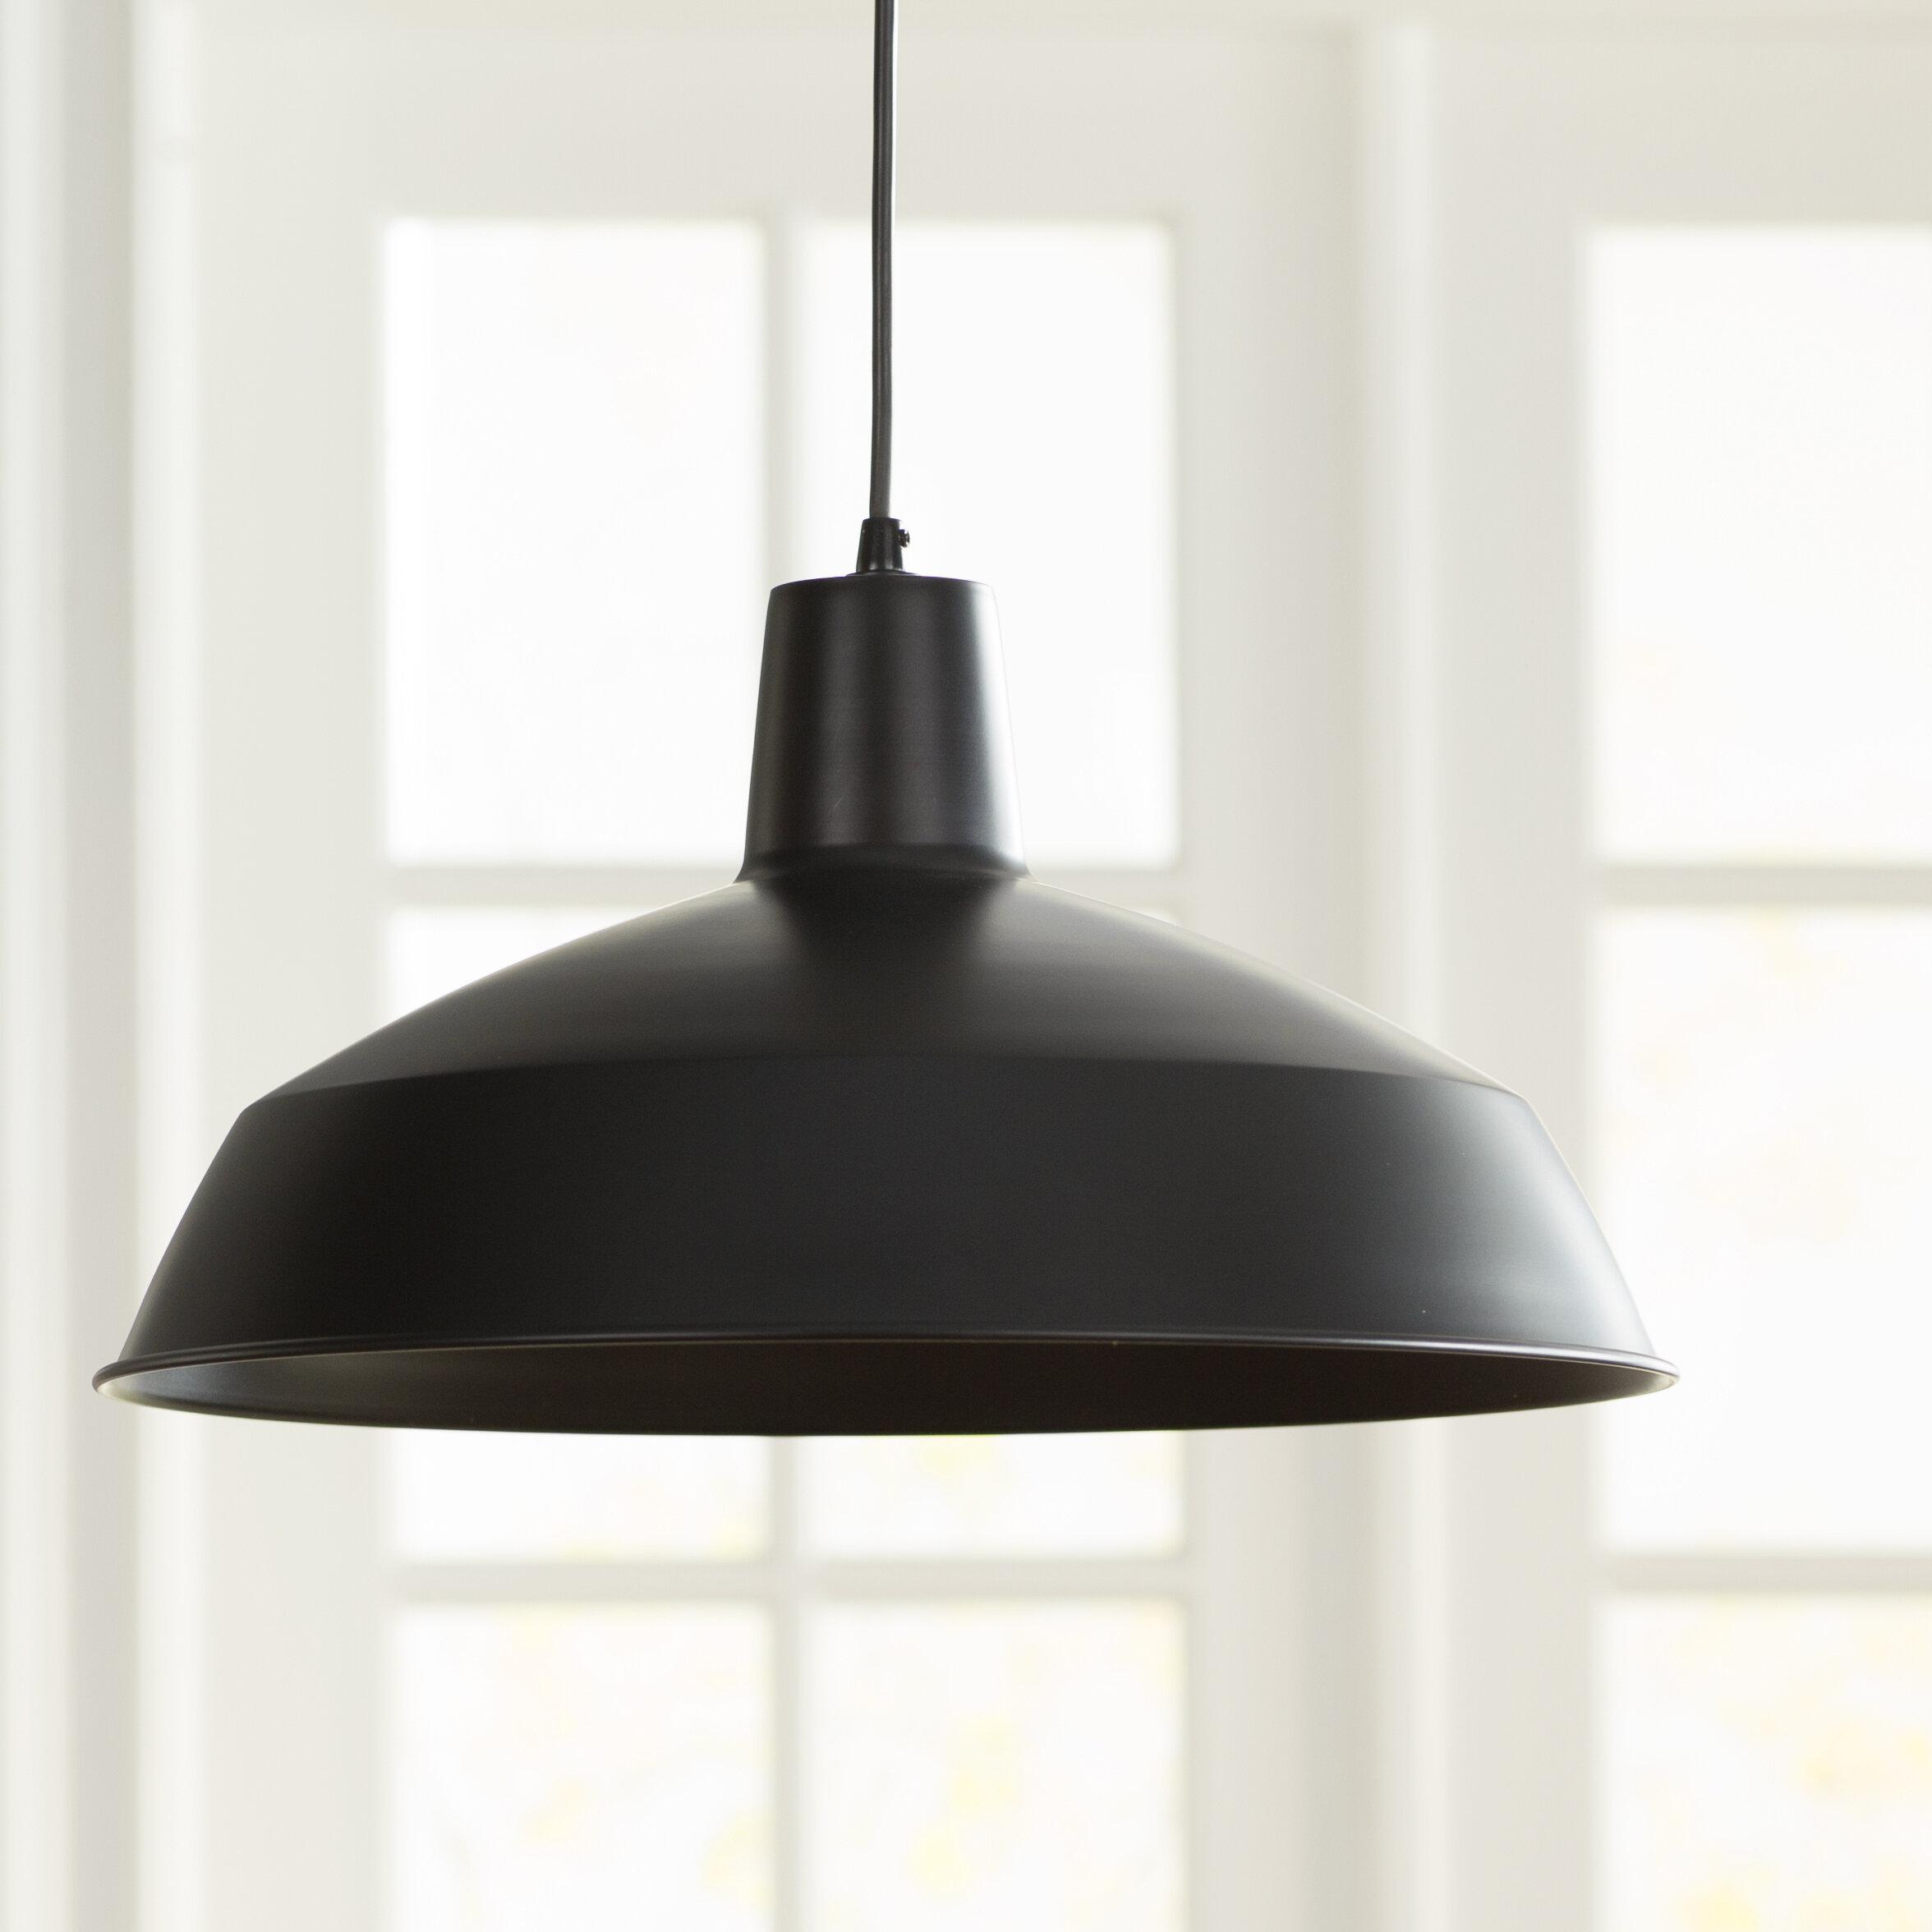 Laurel foundry modern farmhouse barnyard industrial warehouse 1 light bowl pendant reviews wayfair